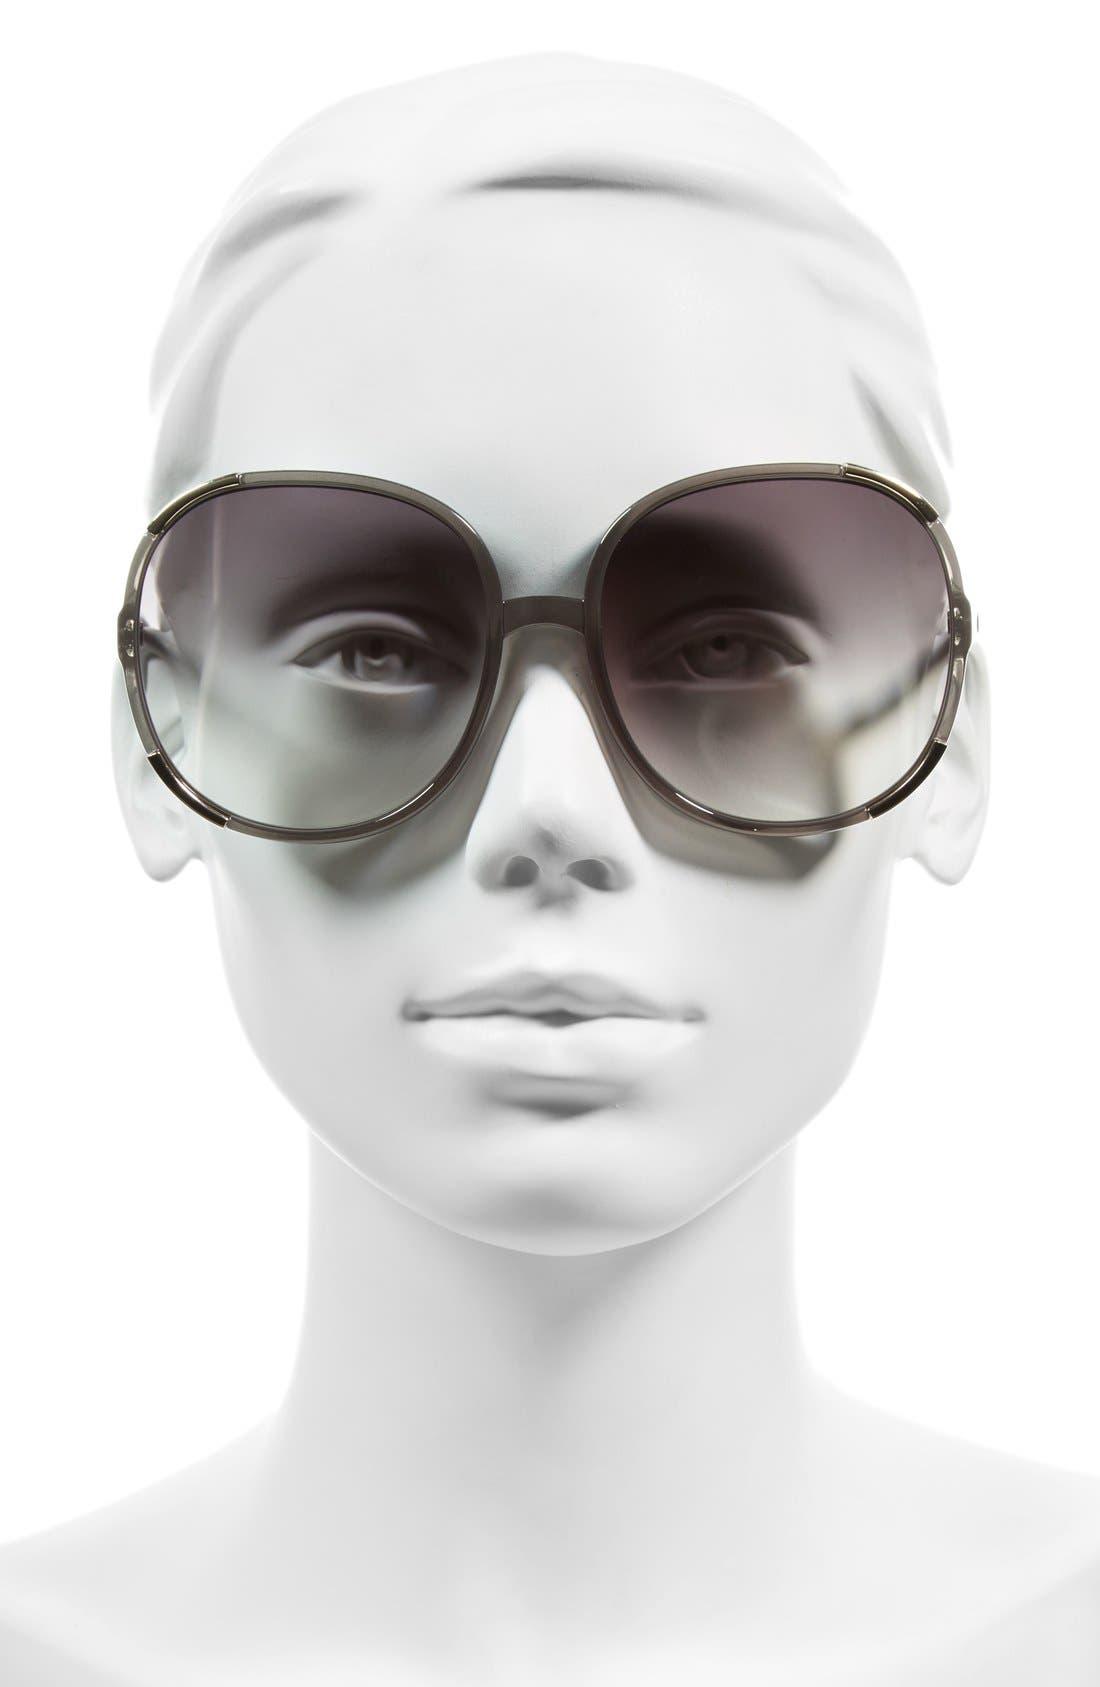 CHLOÉ, Myrte 61mm Sunglasses, Alternate thumbnail 2, color, 036